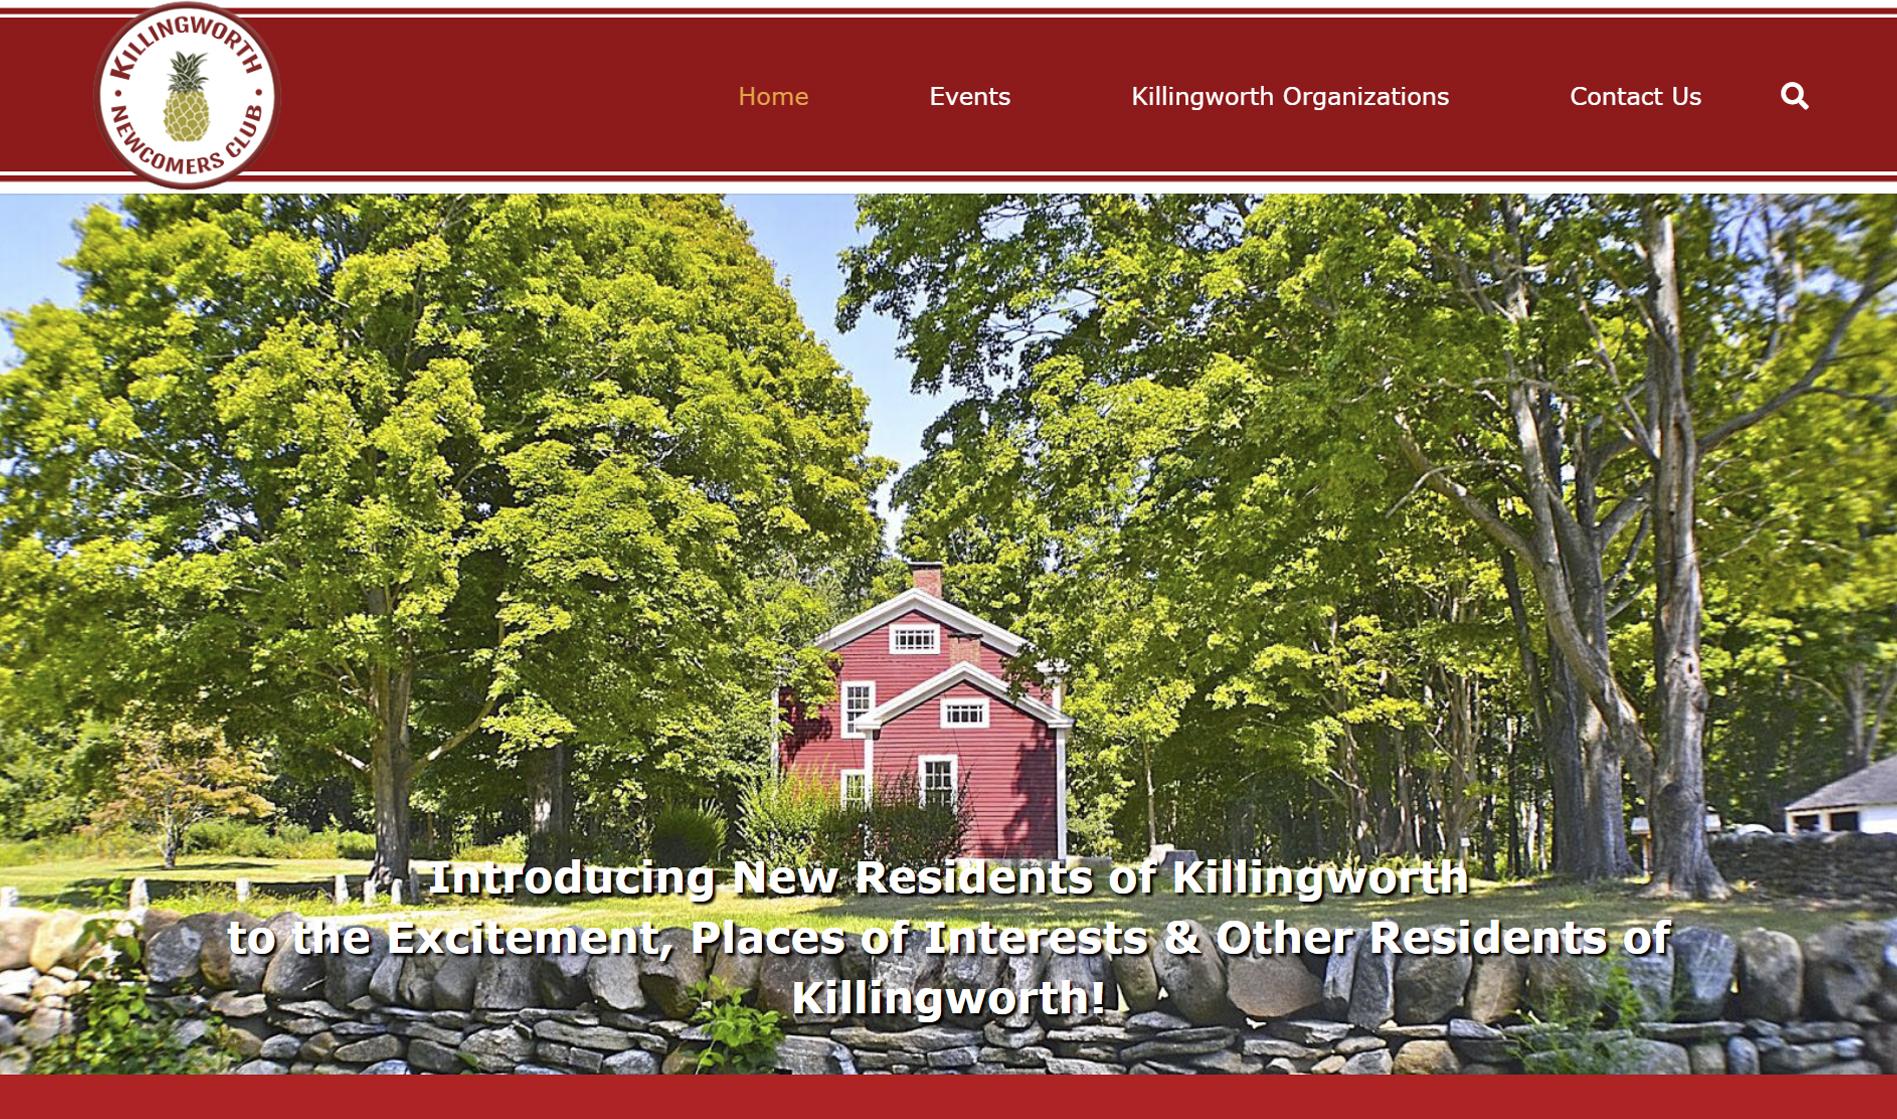 Killingworth Newcomers